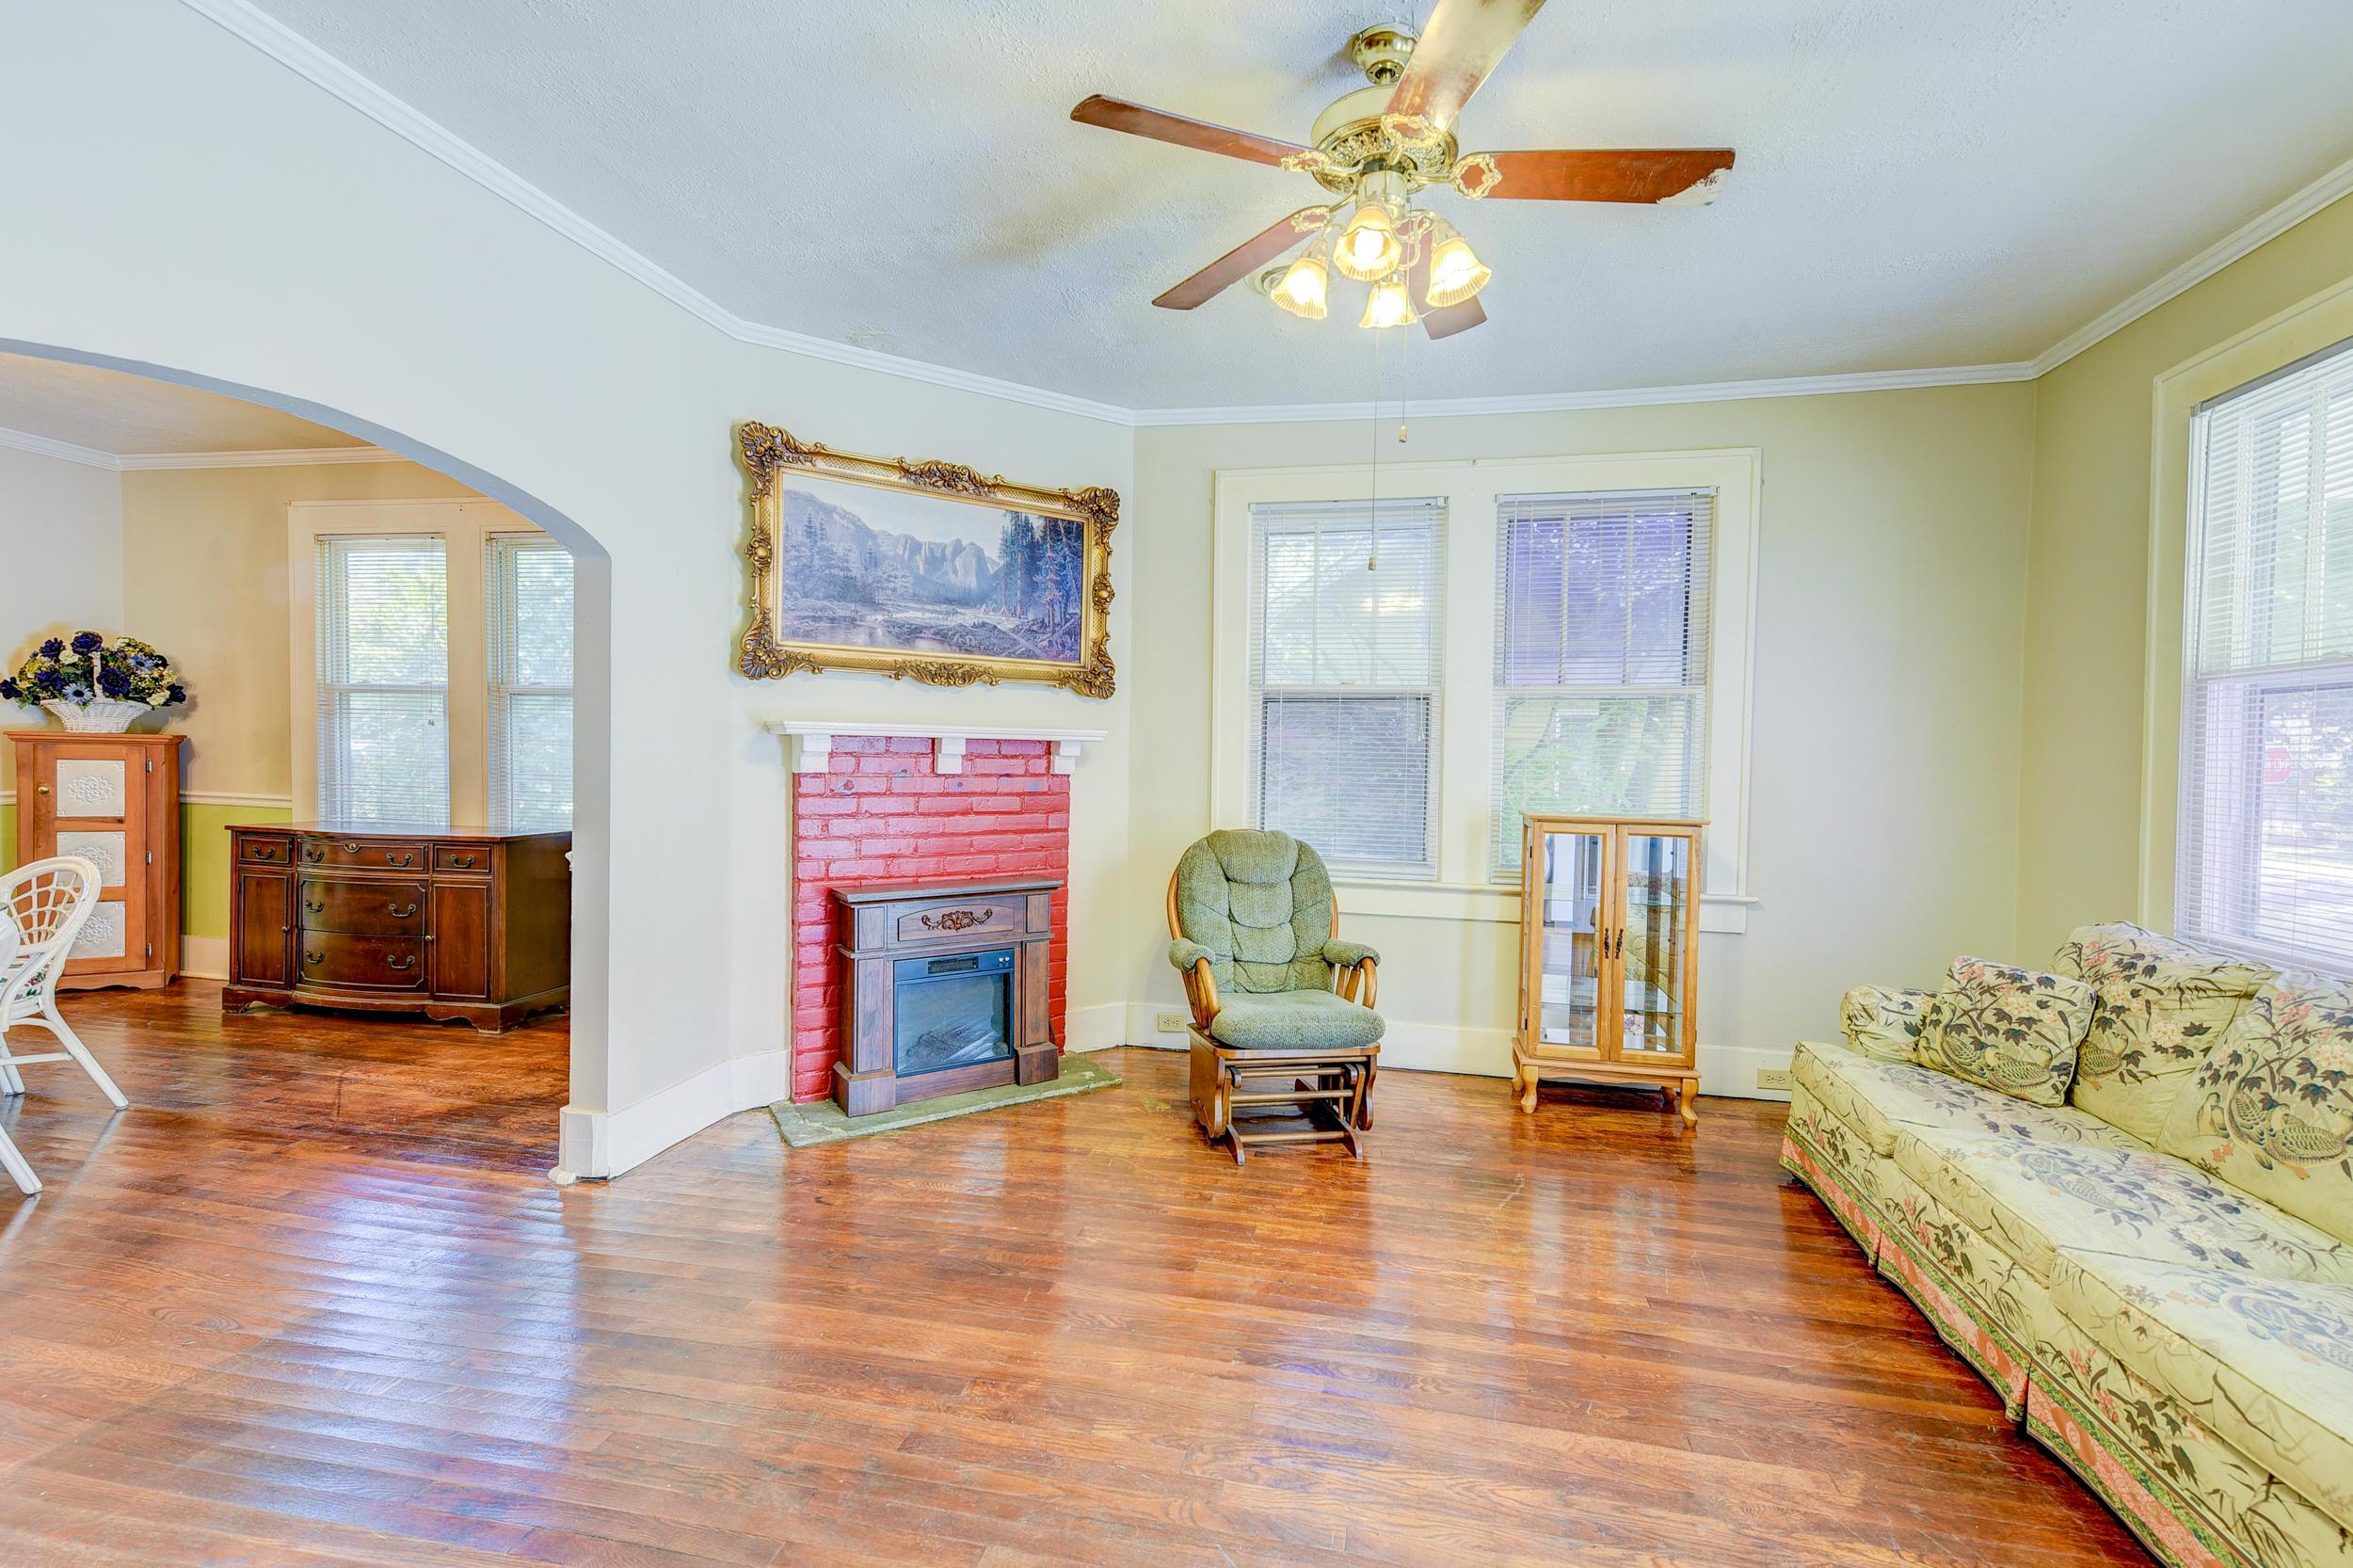 St Andrews Homes For Sale - 1908 2nd, Charleston, SC - 21